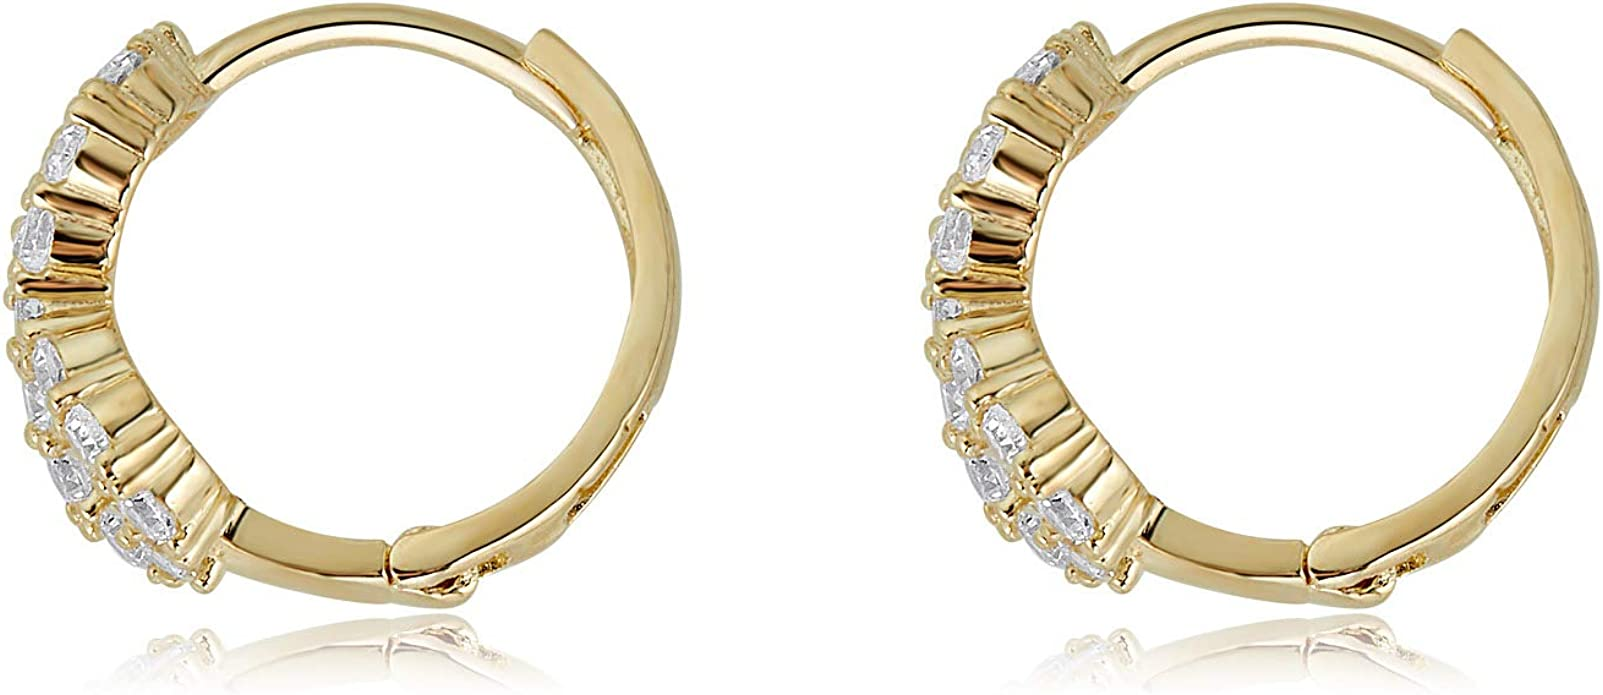 Details about  /10K Gold Polished CZ Hoop Earrings MSRP $359